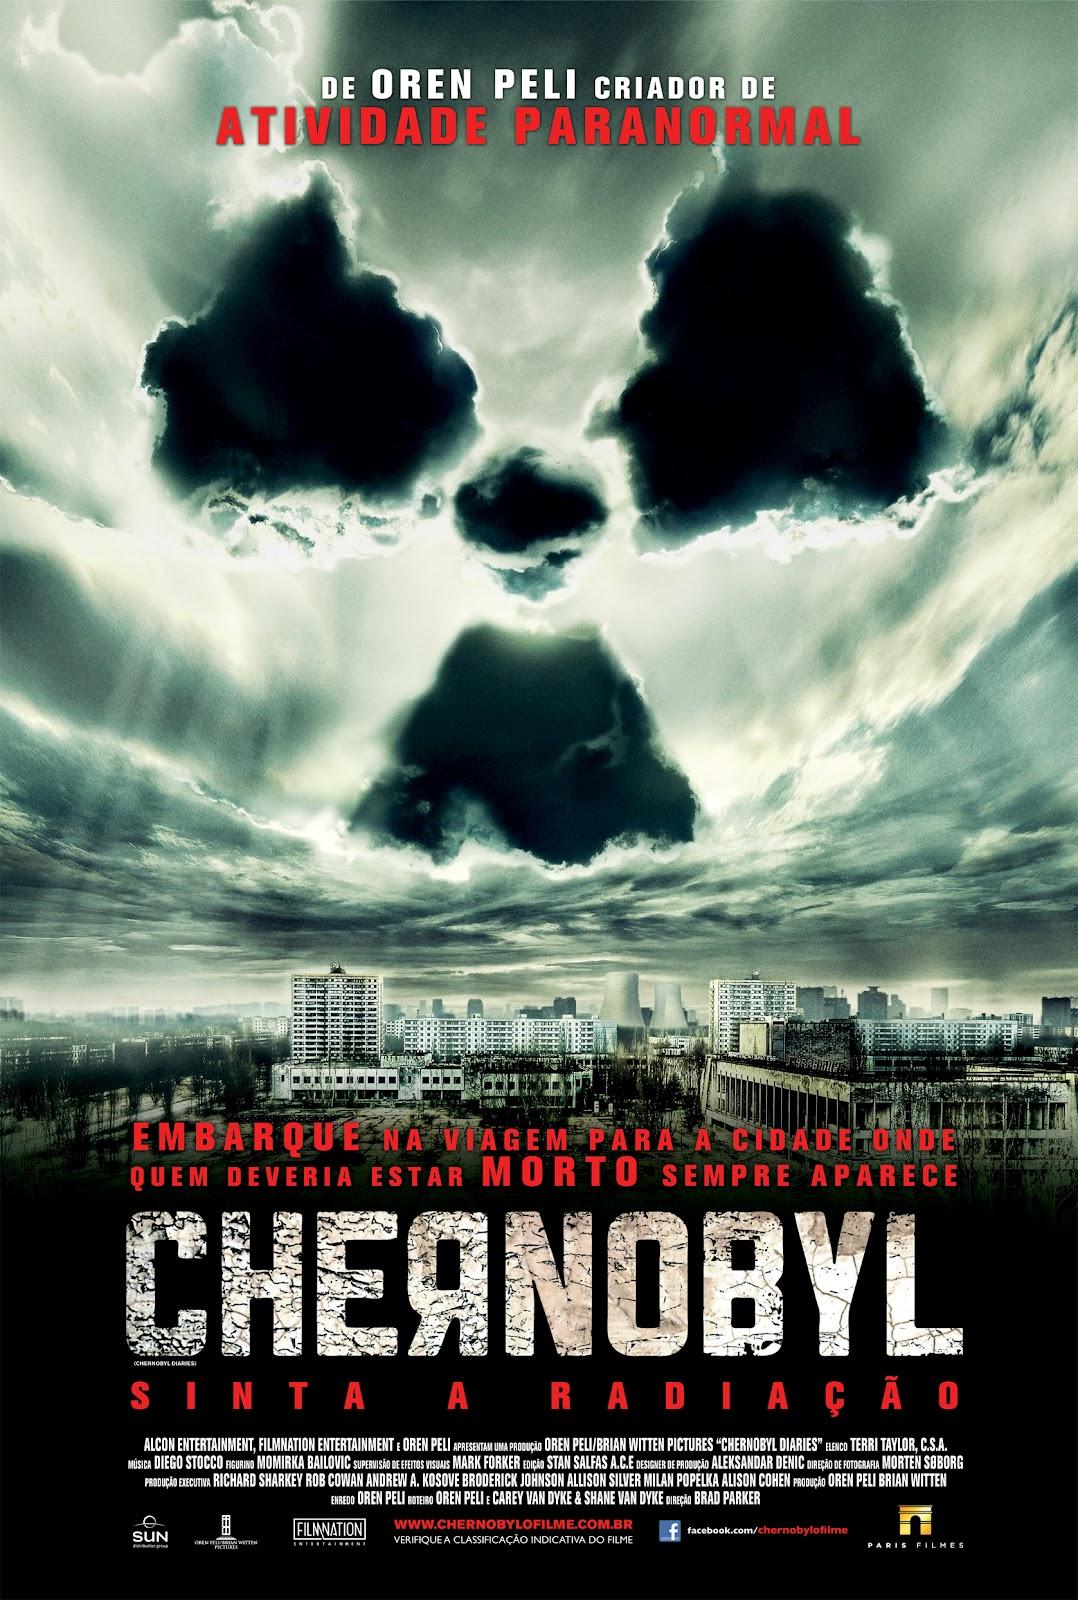 Chernobyl – Sinta a Radiação – Dublado 2012